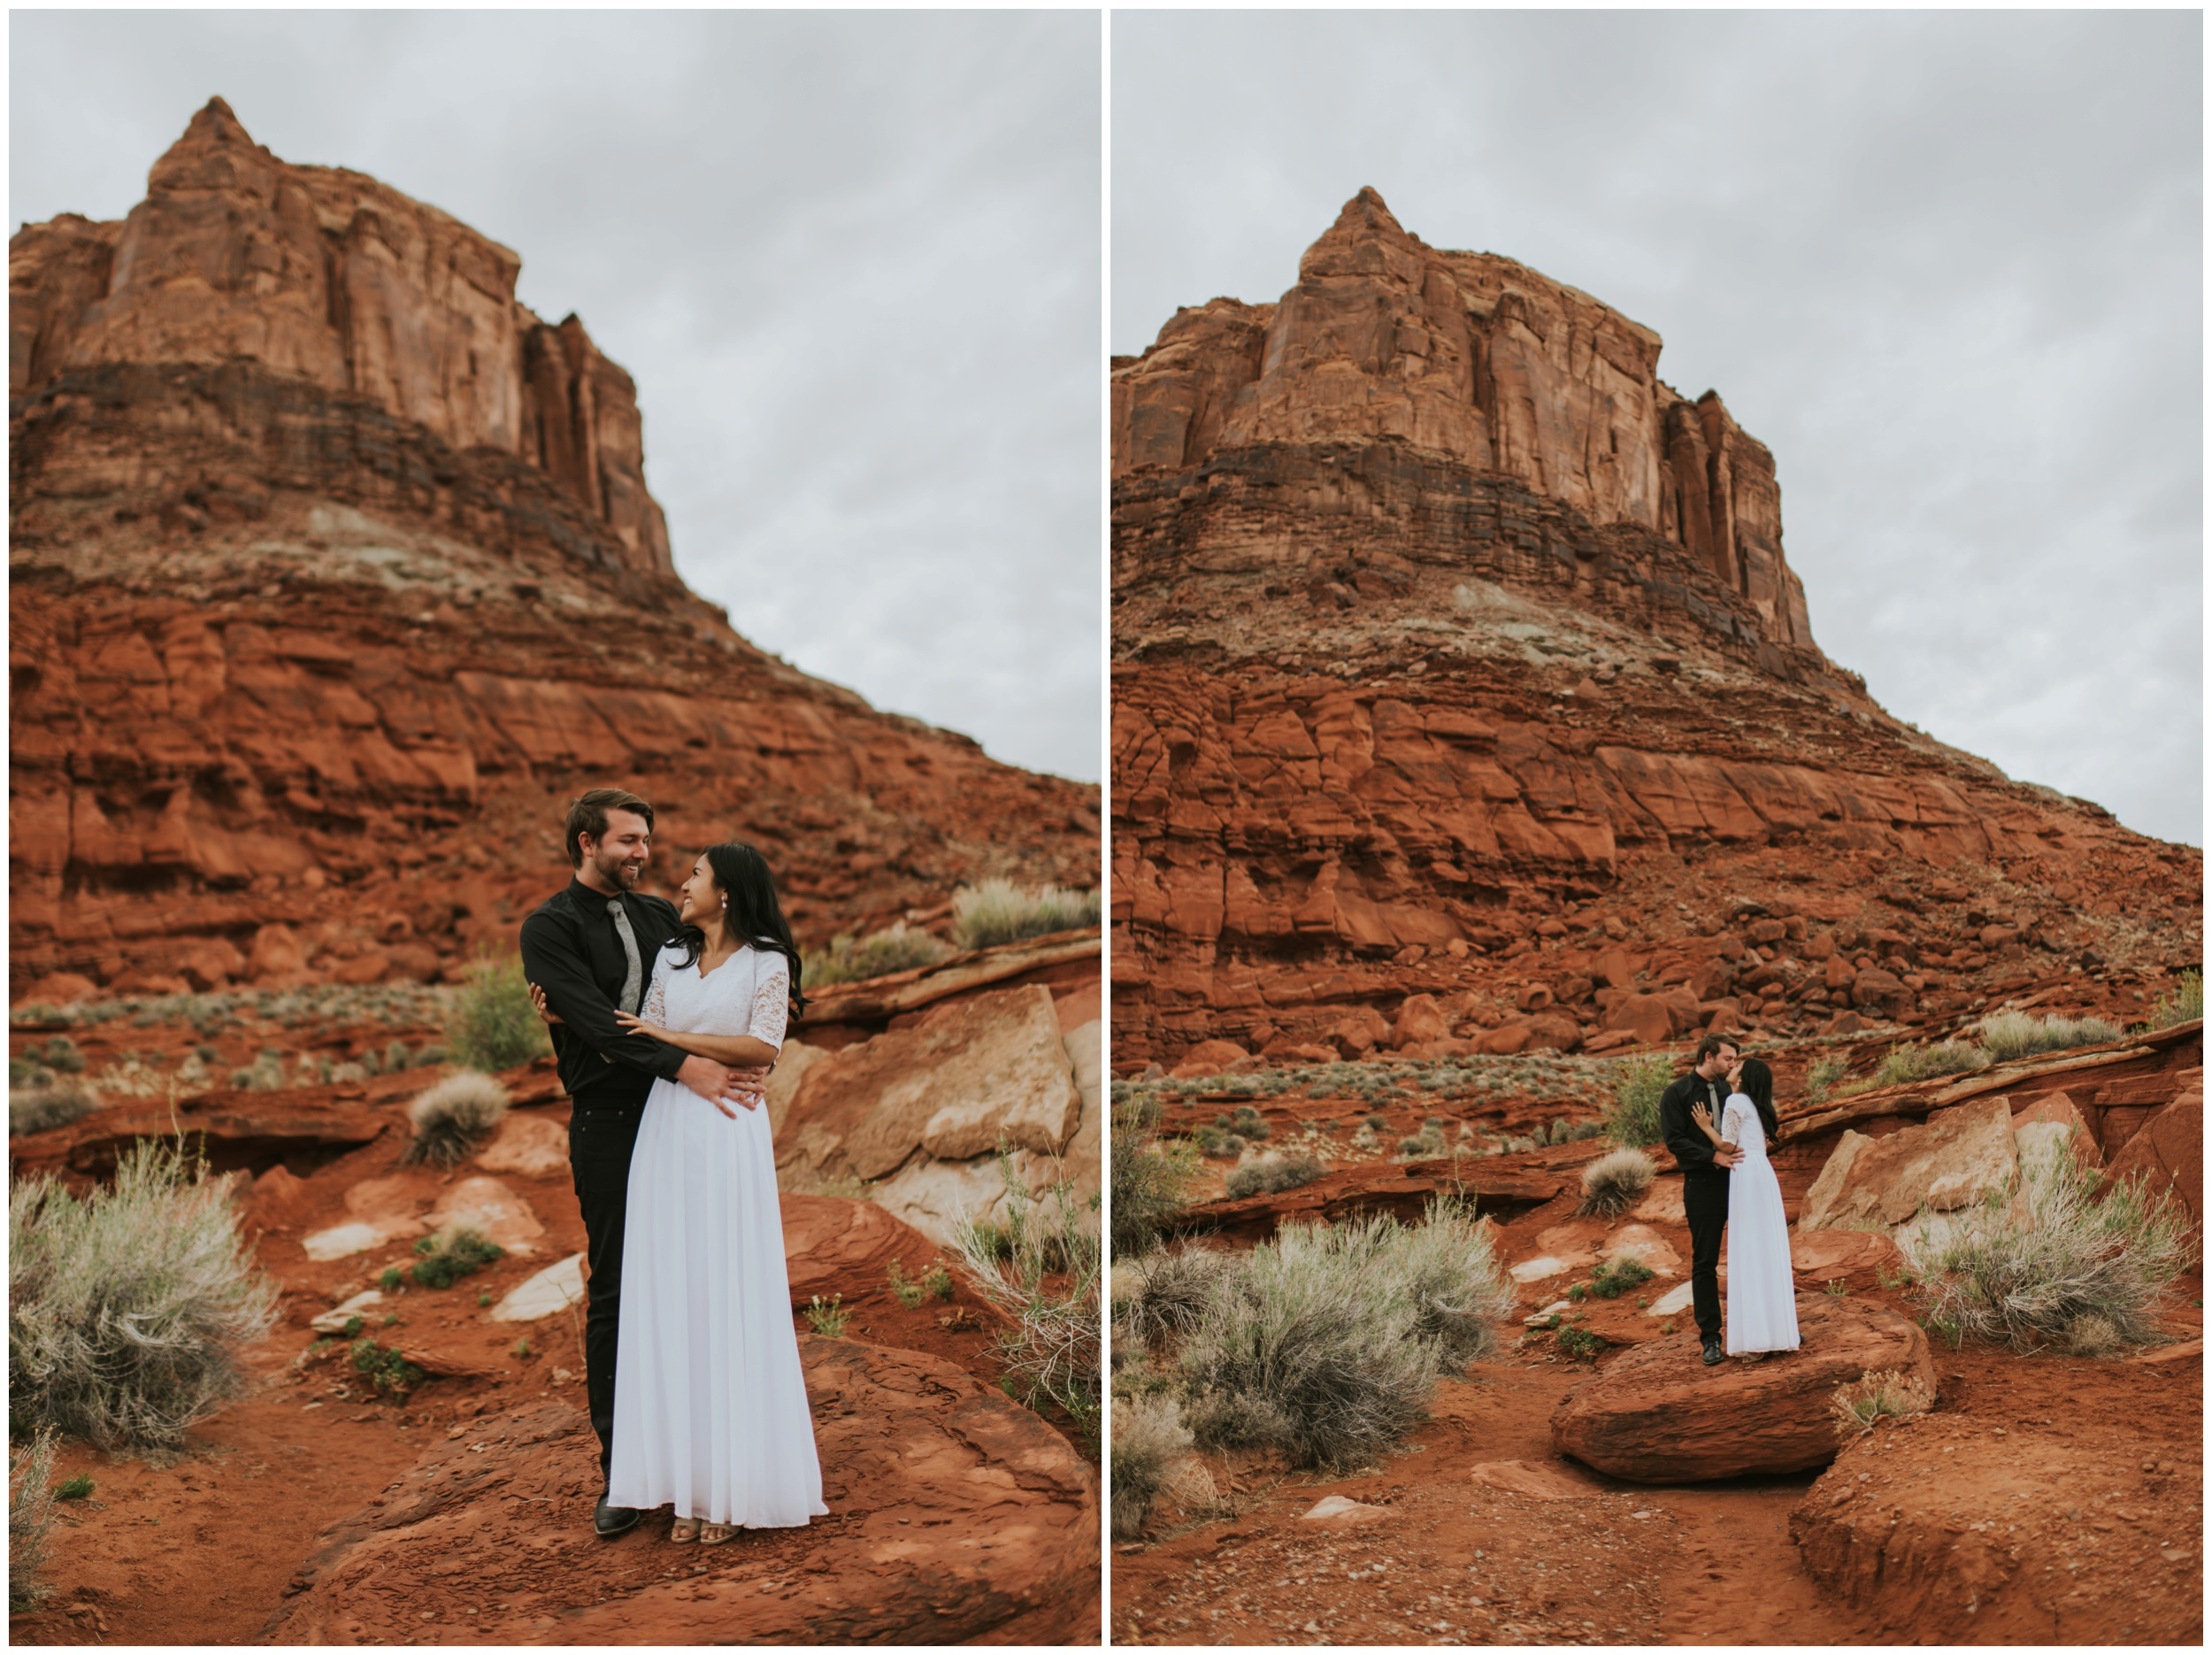 Bride and Groom Portraits at Moab Utah, Destination Elopement |Moab Utah, Photographer www.riversandroadsphotography.com